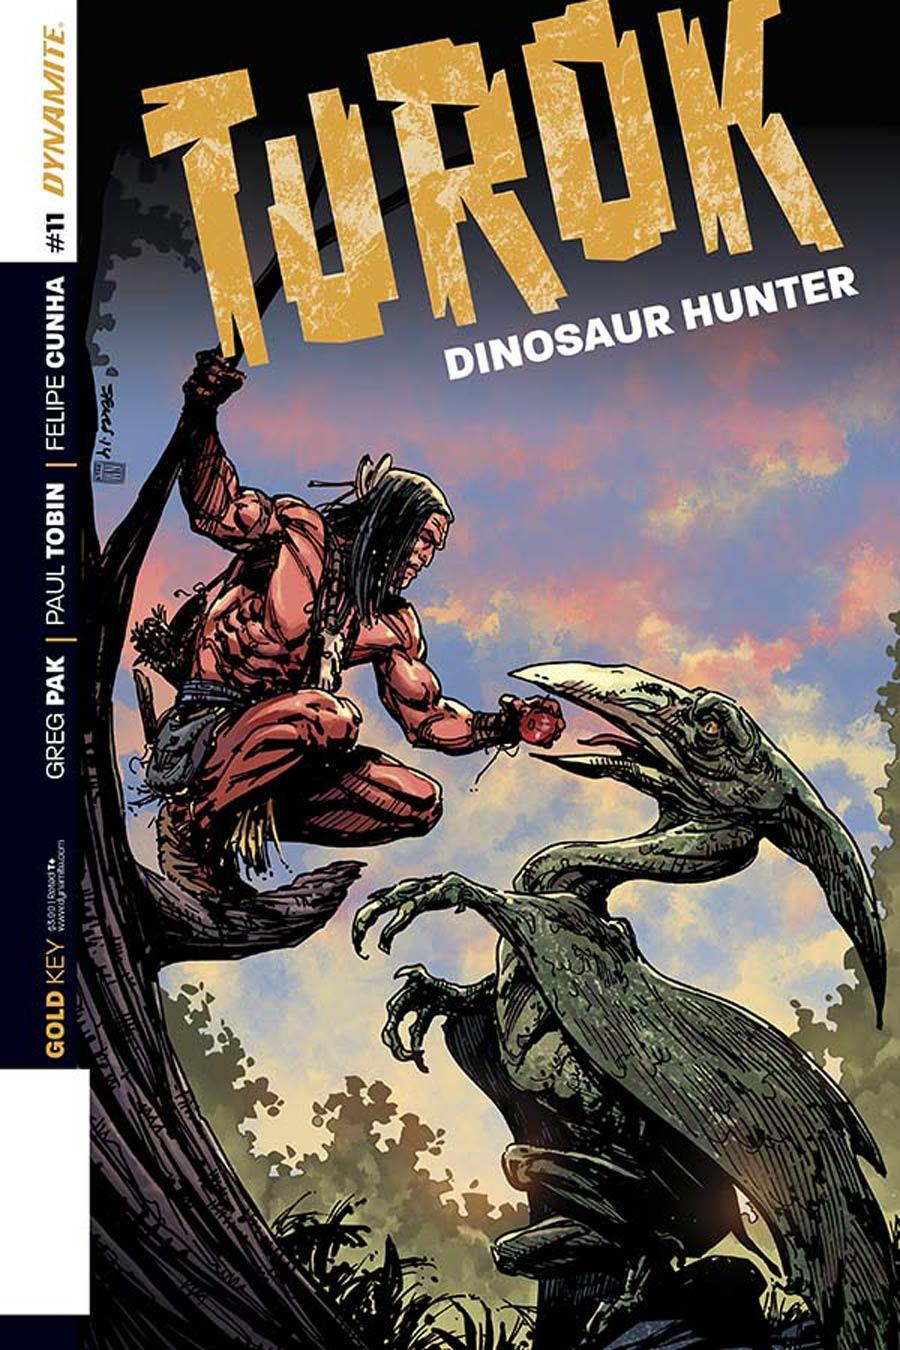 Turok Dinosaur Hunter Vol 2 #11 Cover A Regular Bart Sears Cover